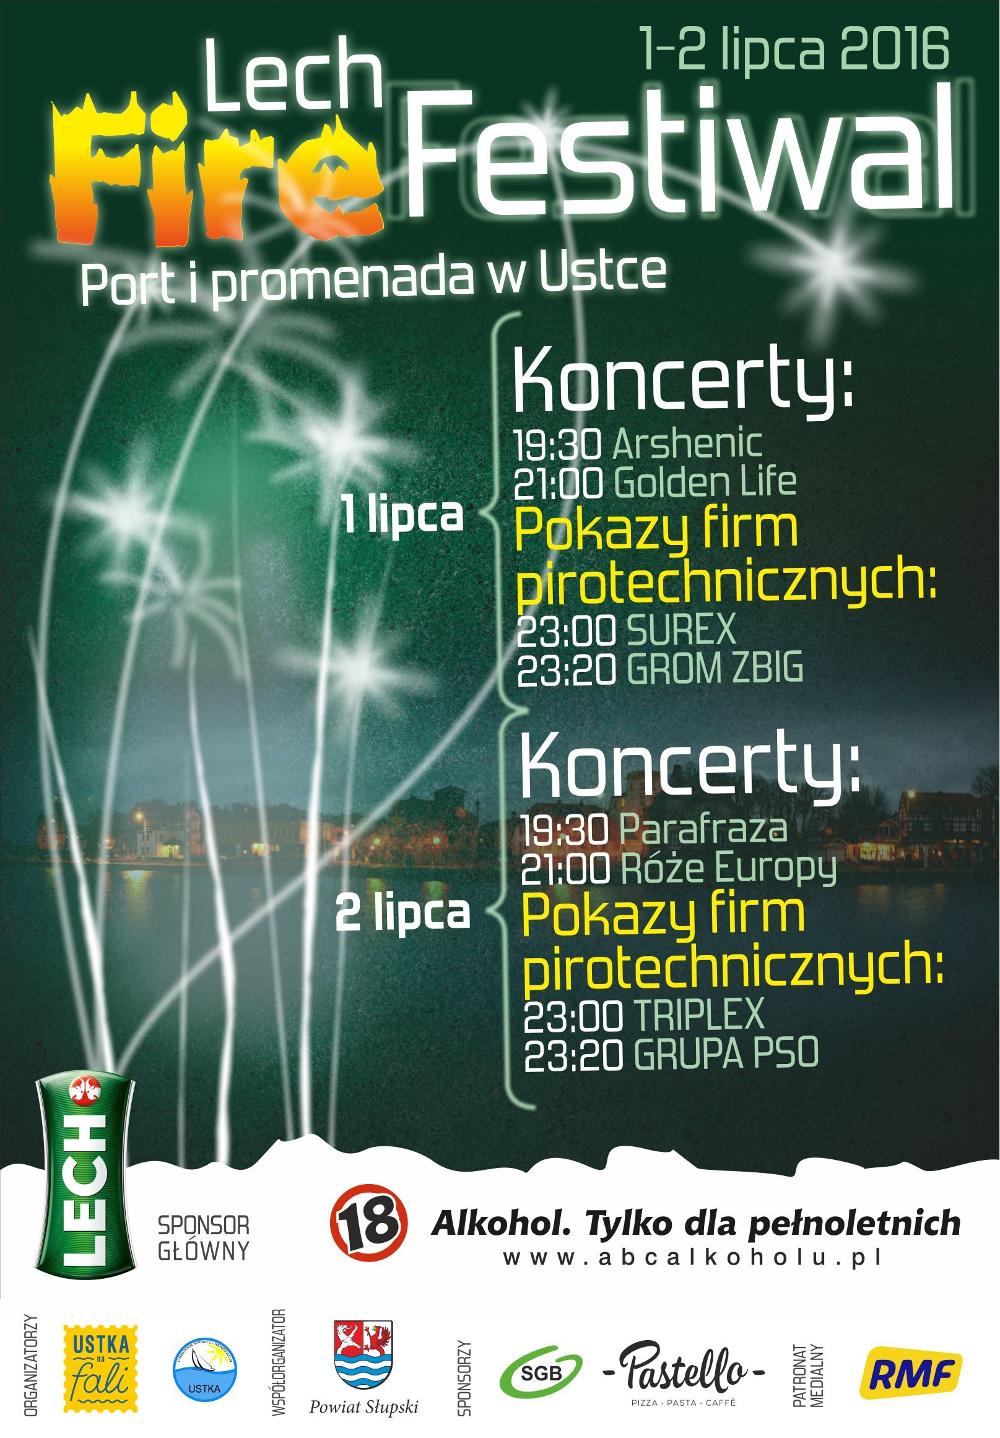 Lech Fire Festiwal 2016, plakat.